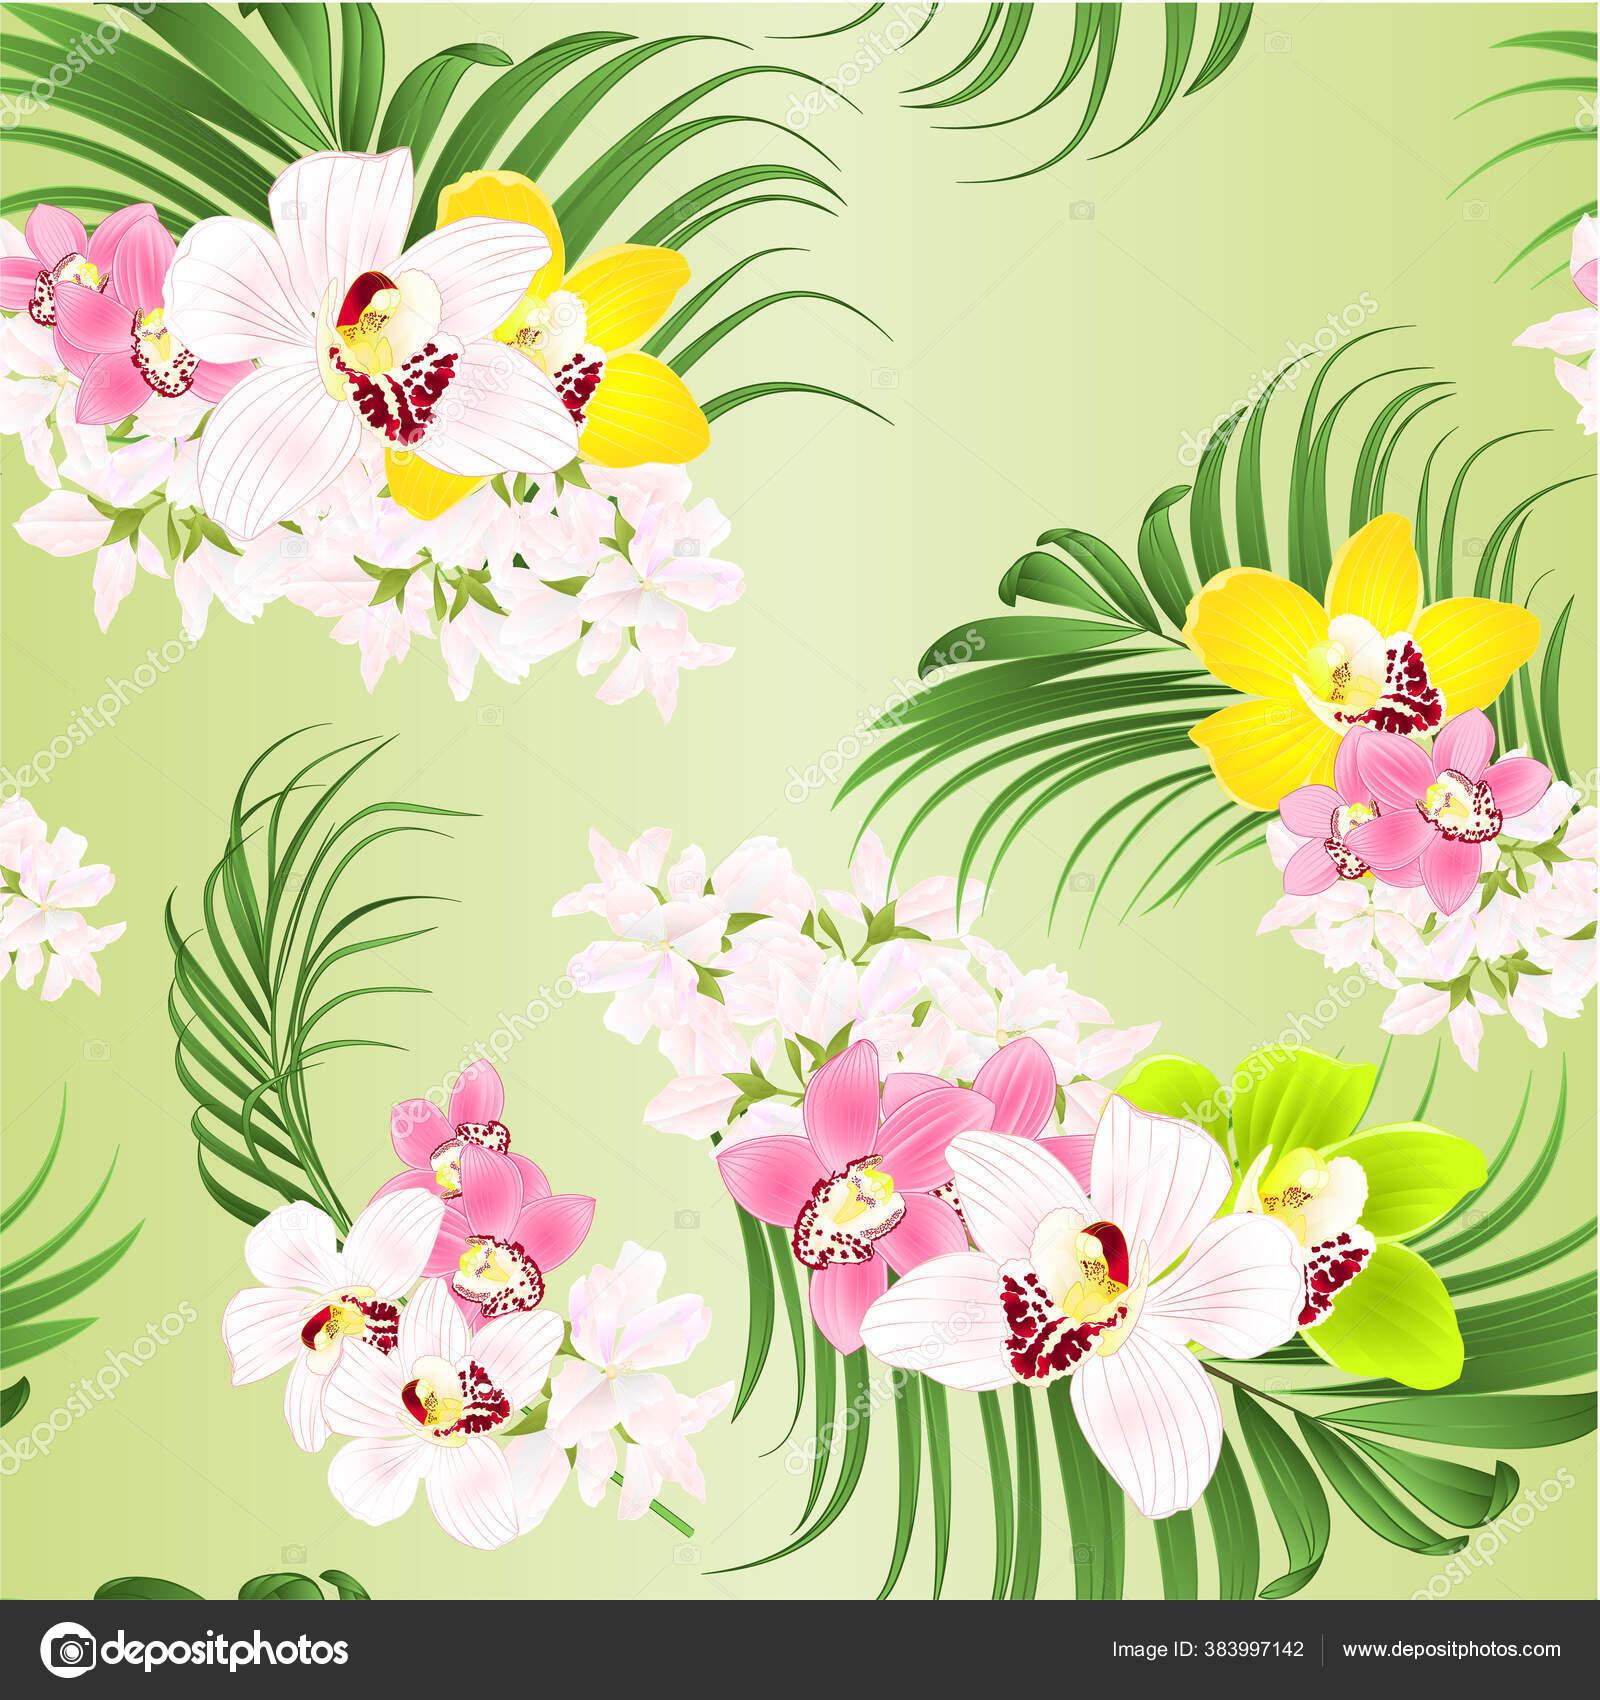 Seamless Texture Bouquet Tropical Flowers Floral Arrangement Beautiful Pink Green Stock Vector C Tina5 383997142